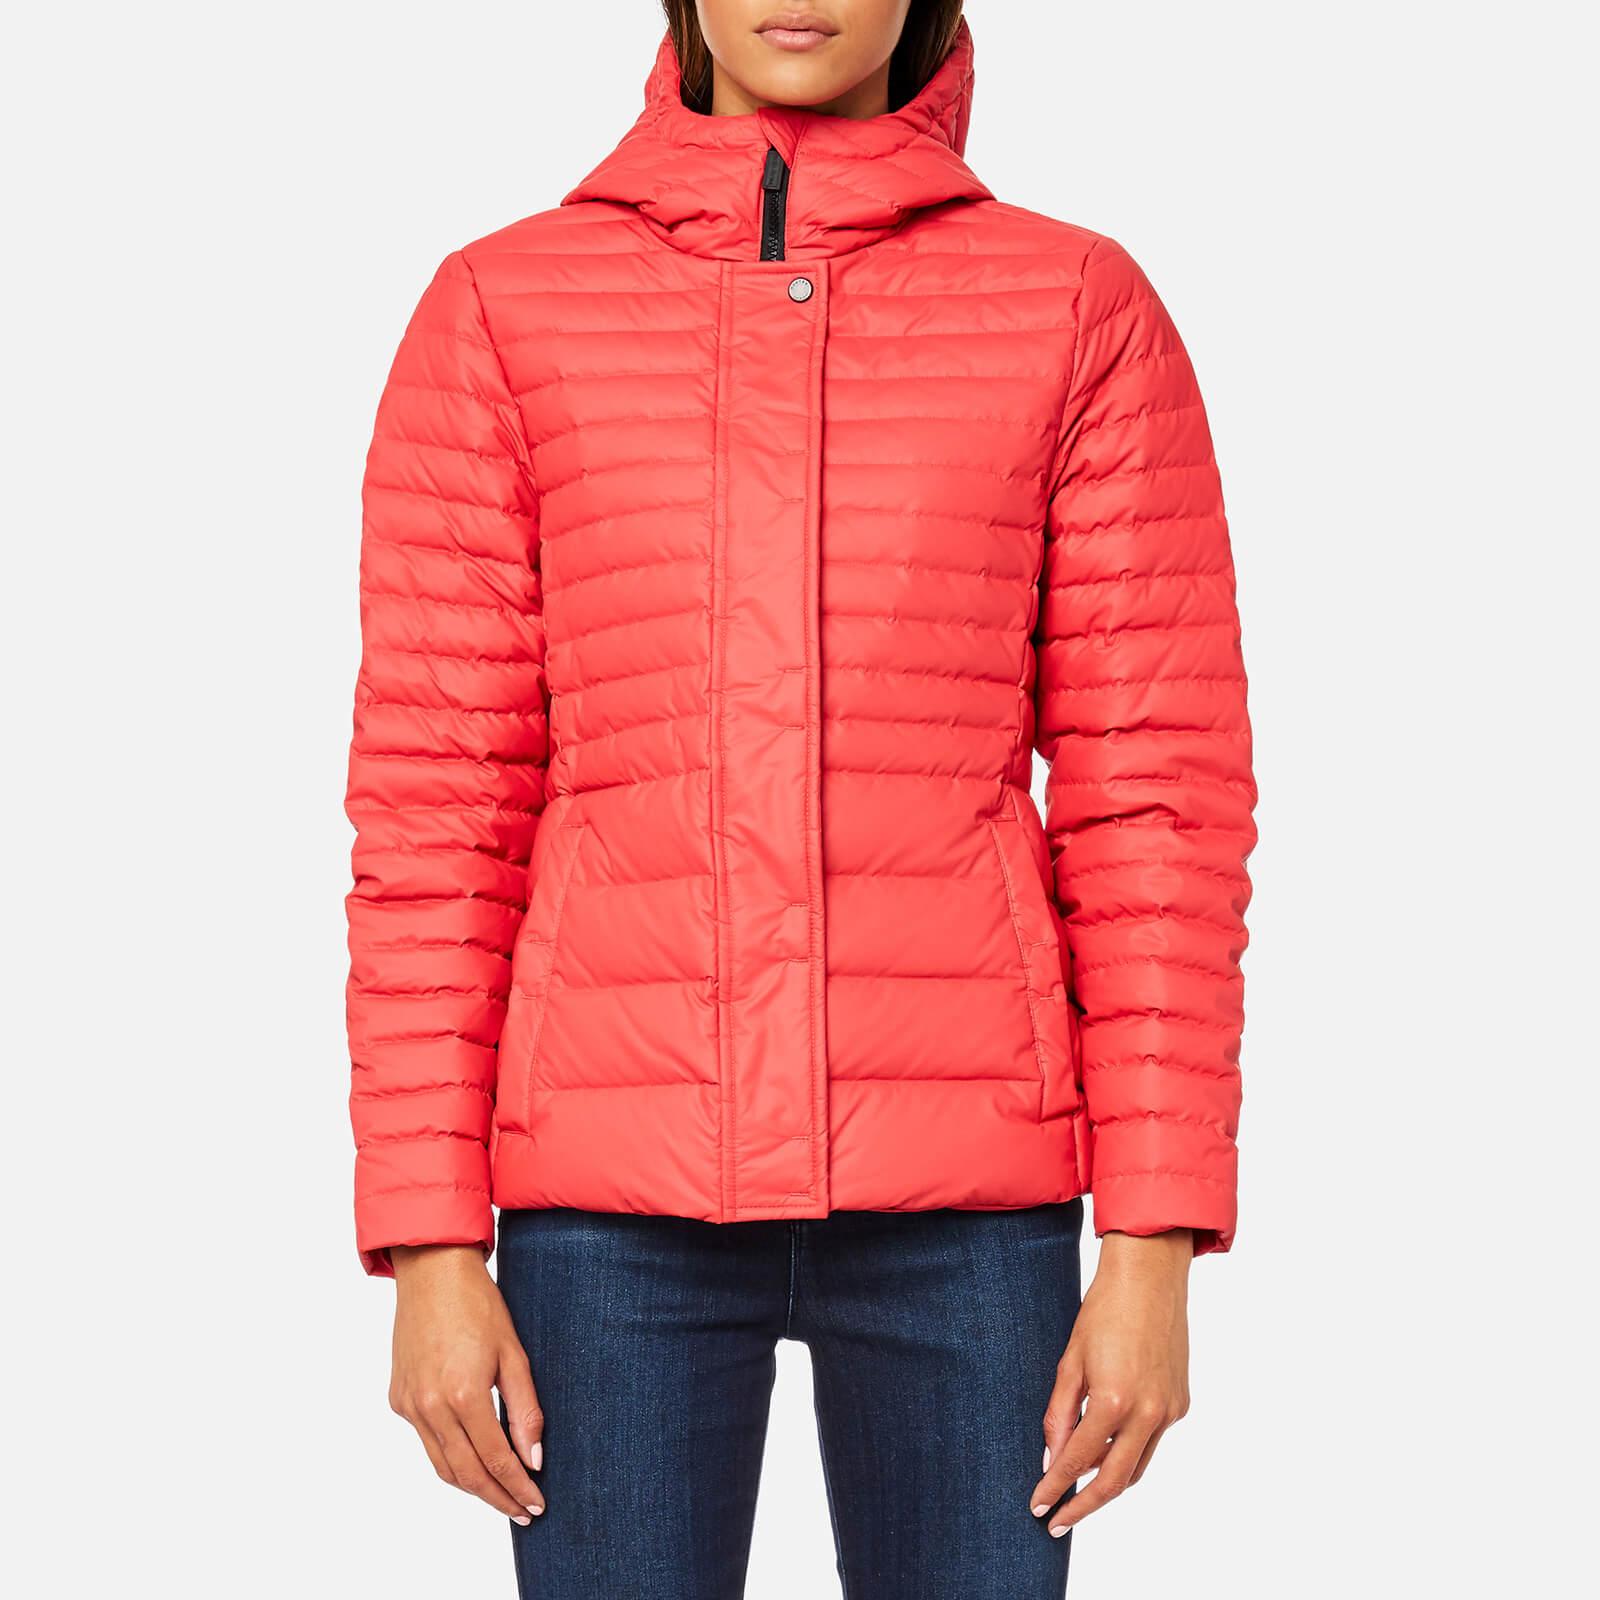 e4e7d662b0566 Hunter Women's Original Refined Down Jacket - Bright Coral - Free UK  Delivery over £50